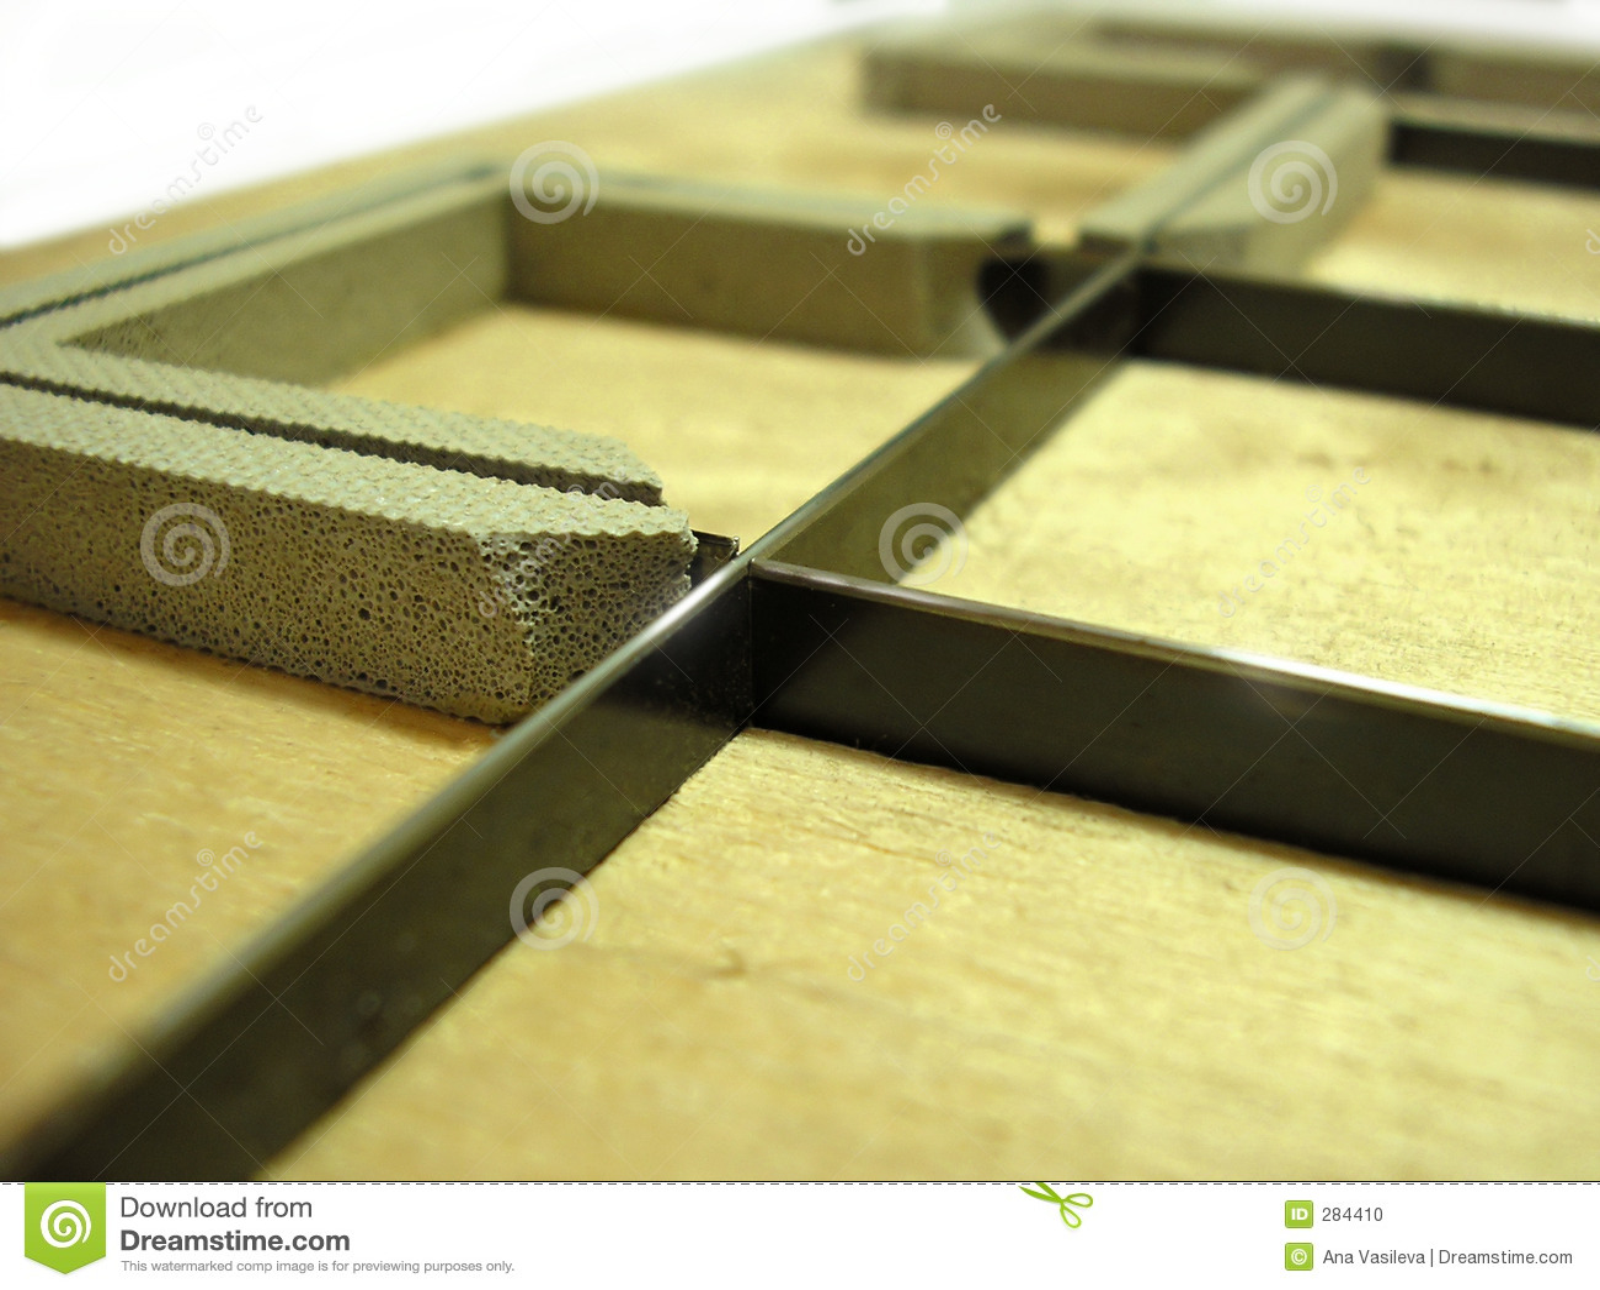 Skäraren matris industripolygraphyen